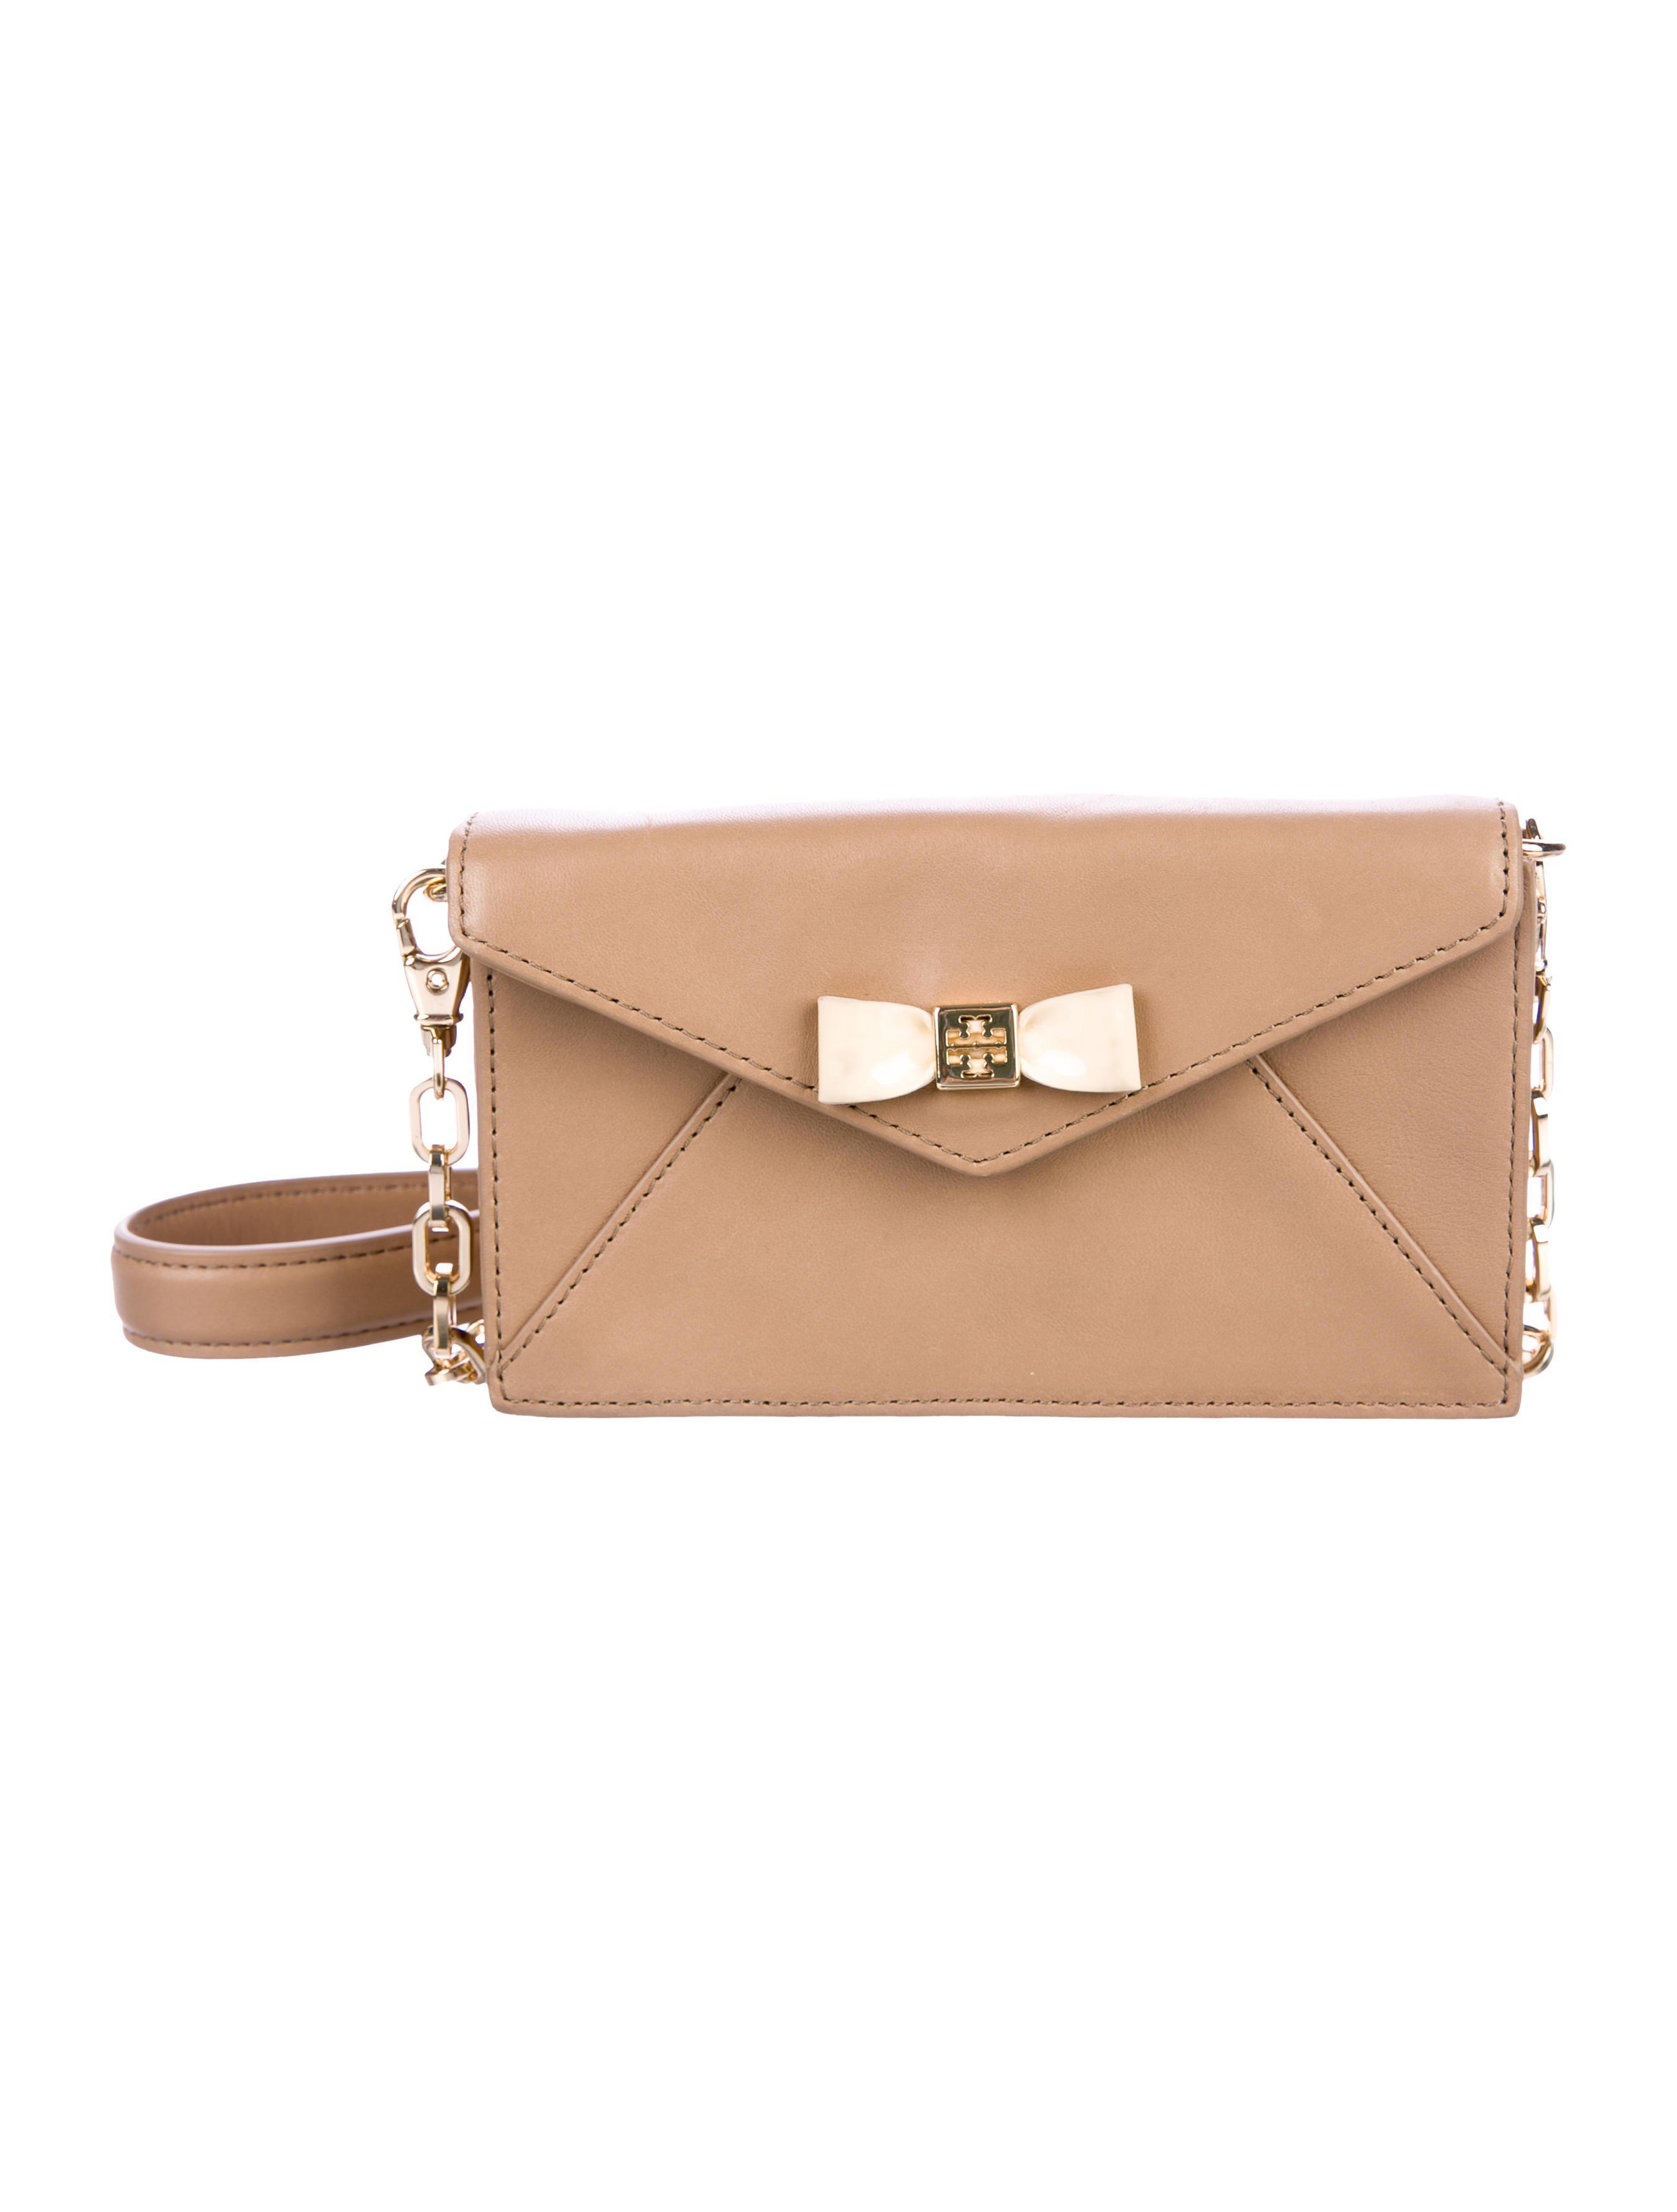 43fcd589f09 Lyst - Tory Burch Bow Envelope Crossbody Bag Gold in Metallic